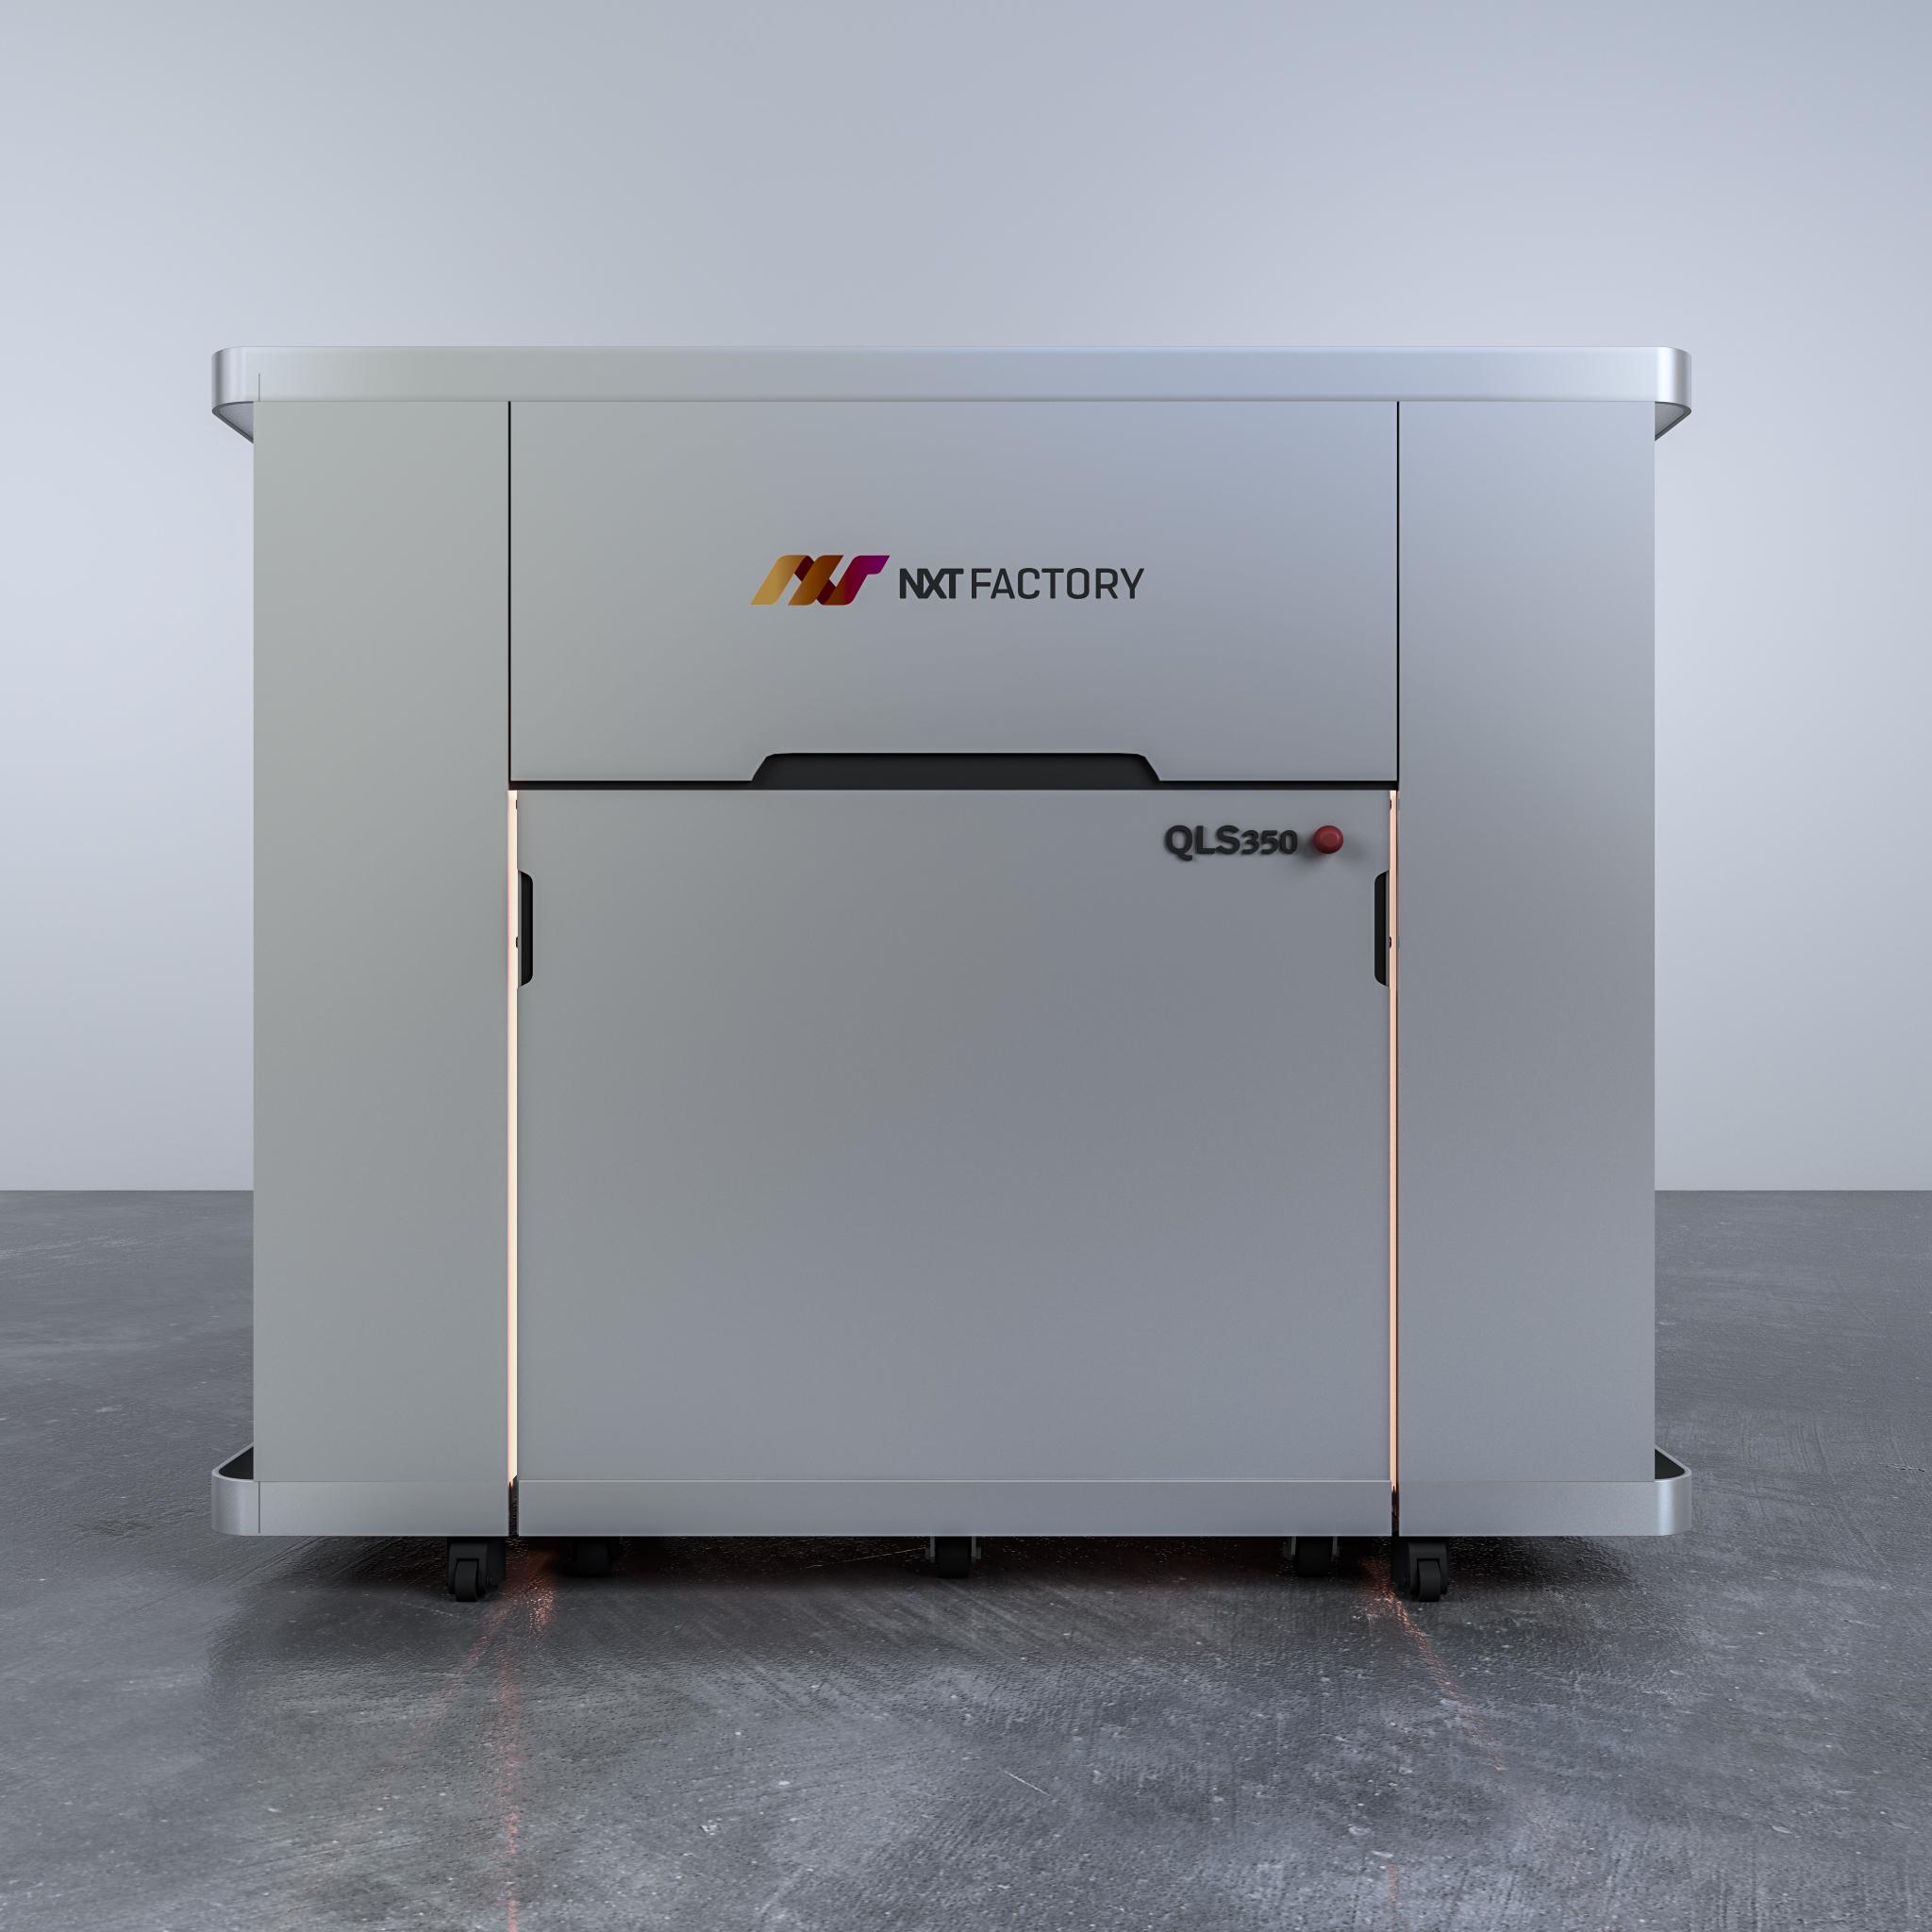 The QLS 350 3D printer. Photo via NXT Factory.